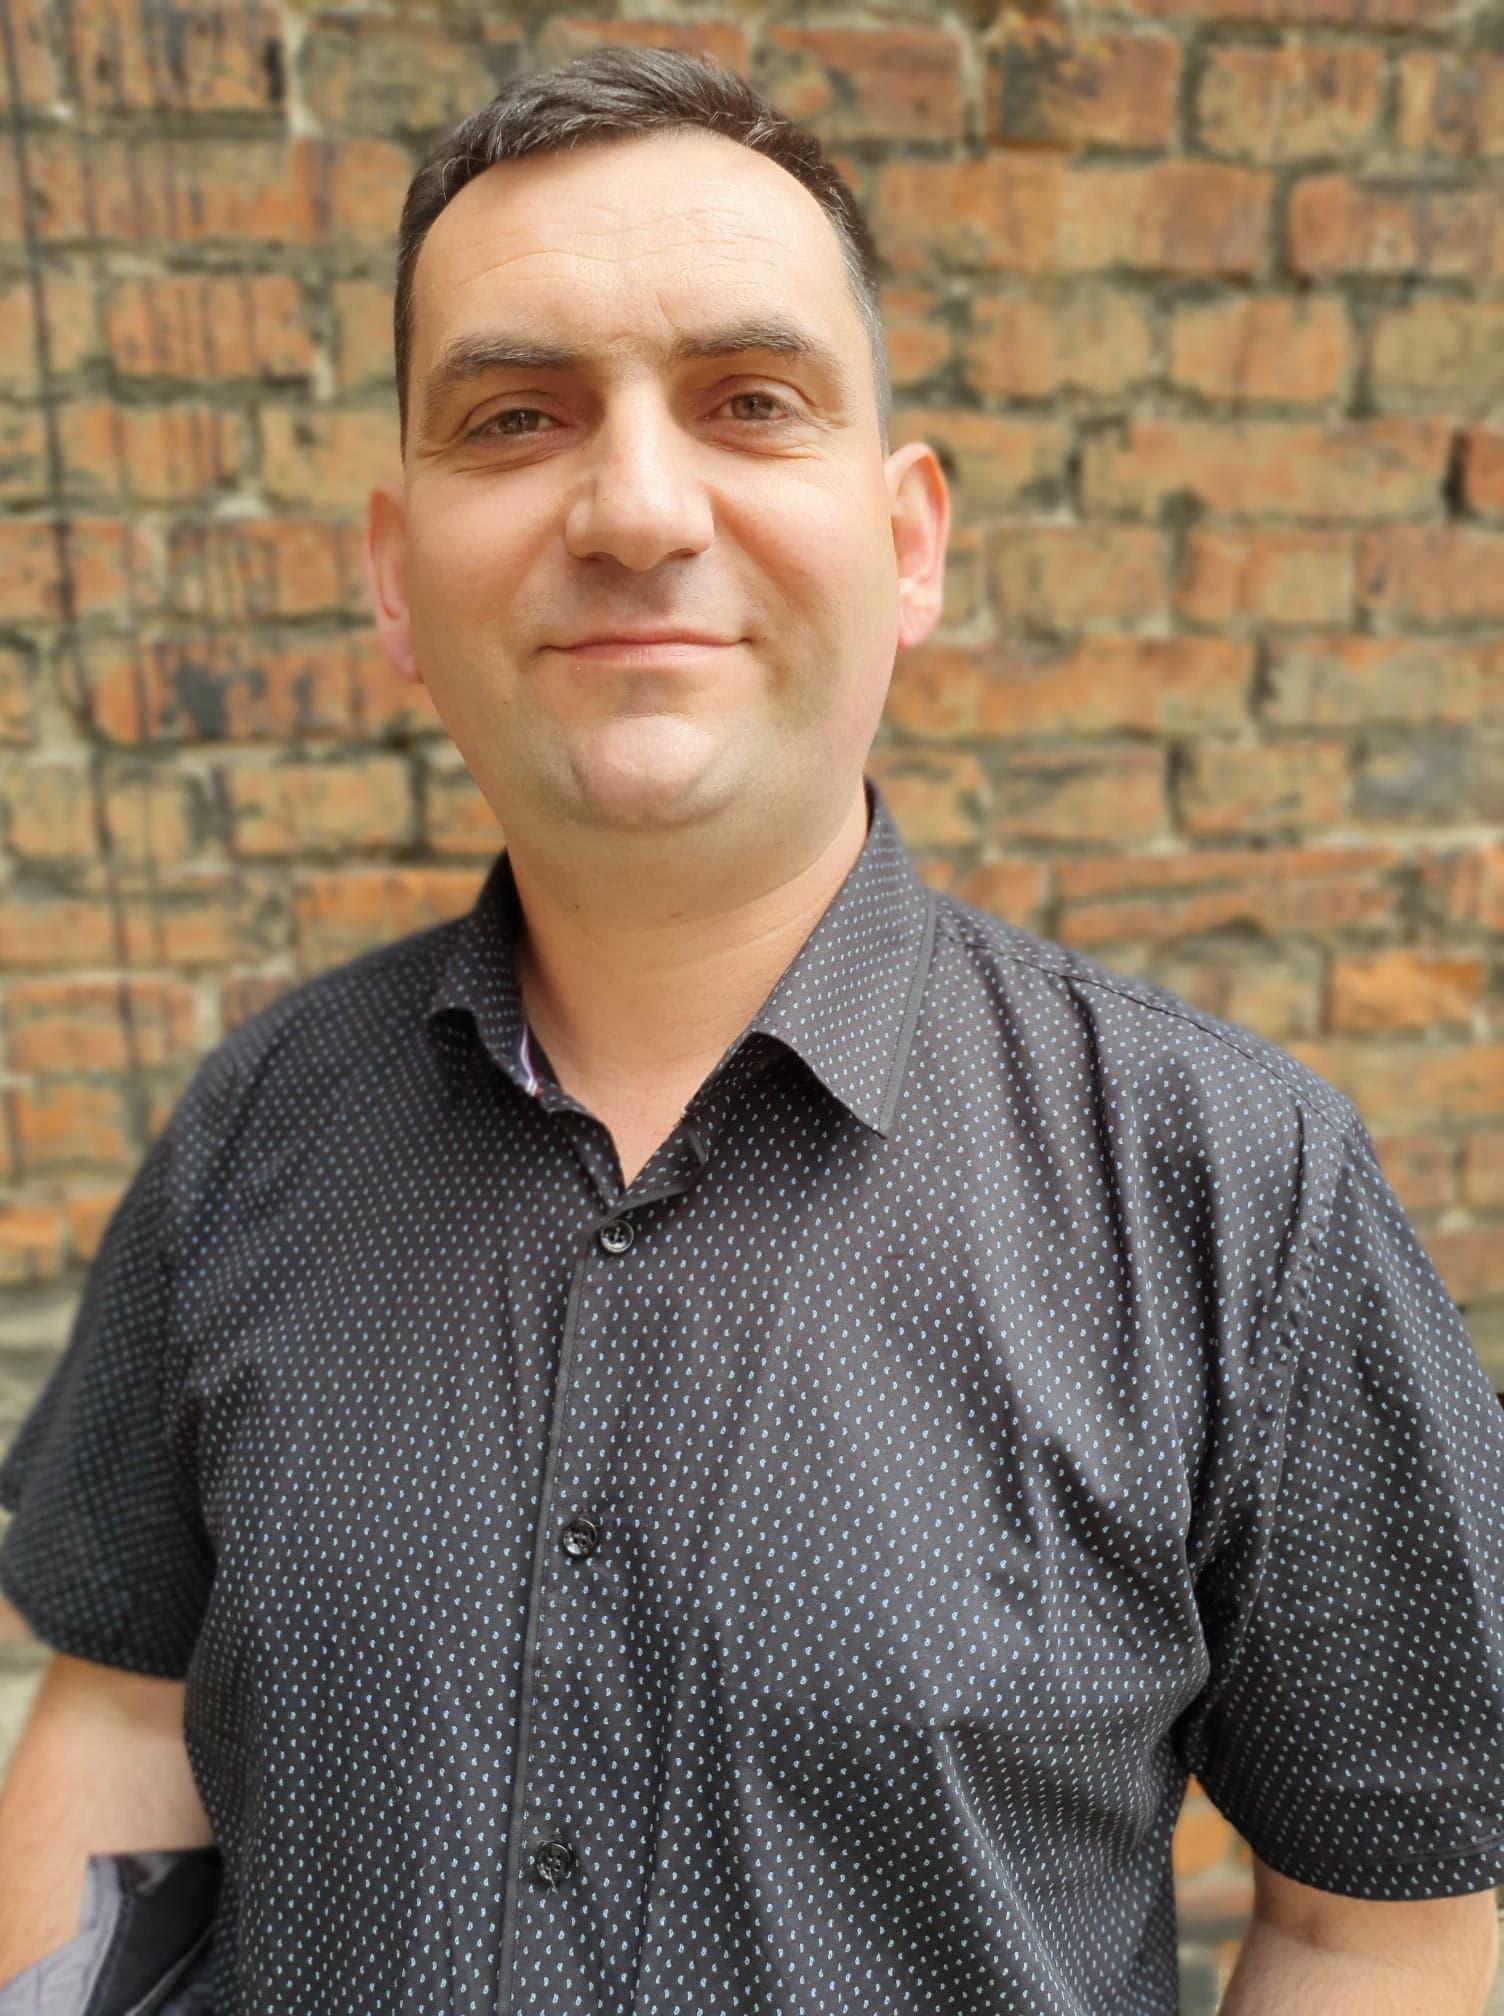 Tomek Boik